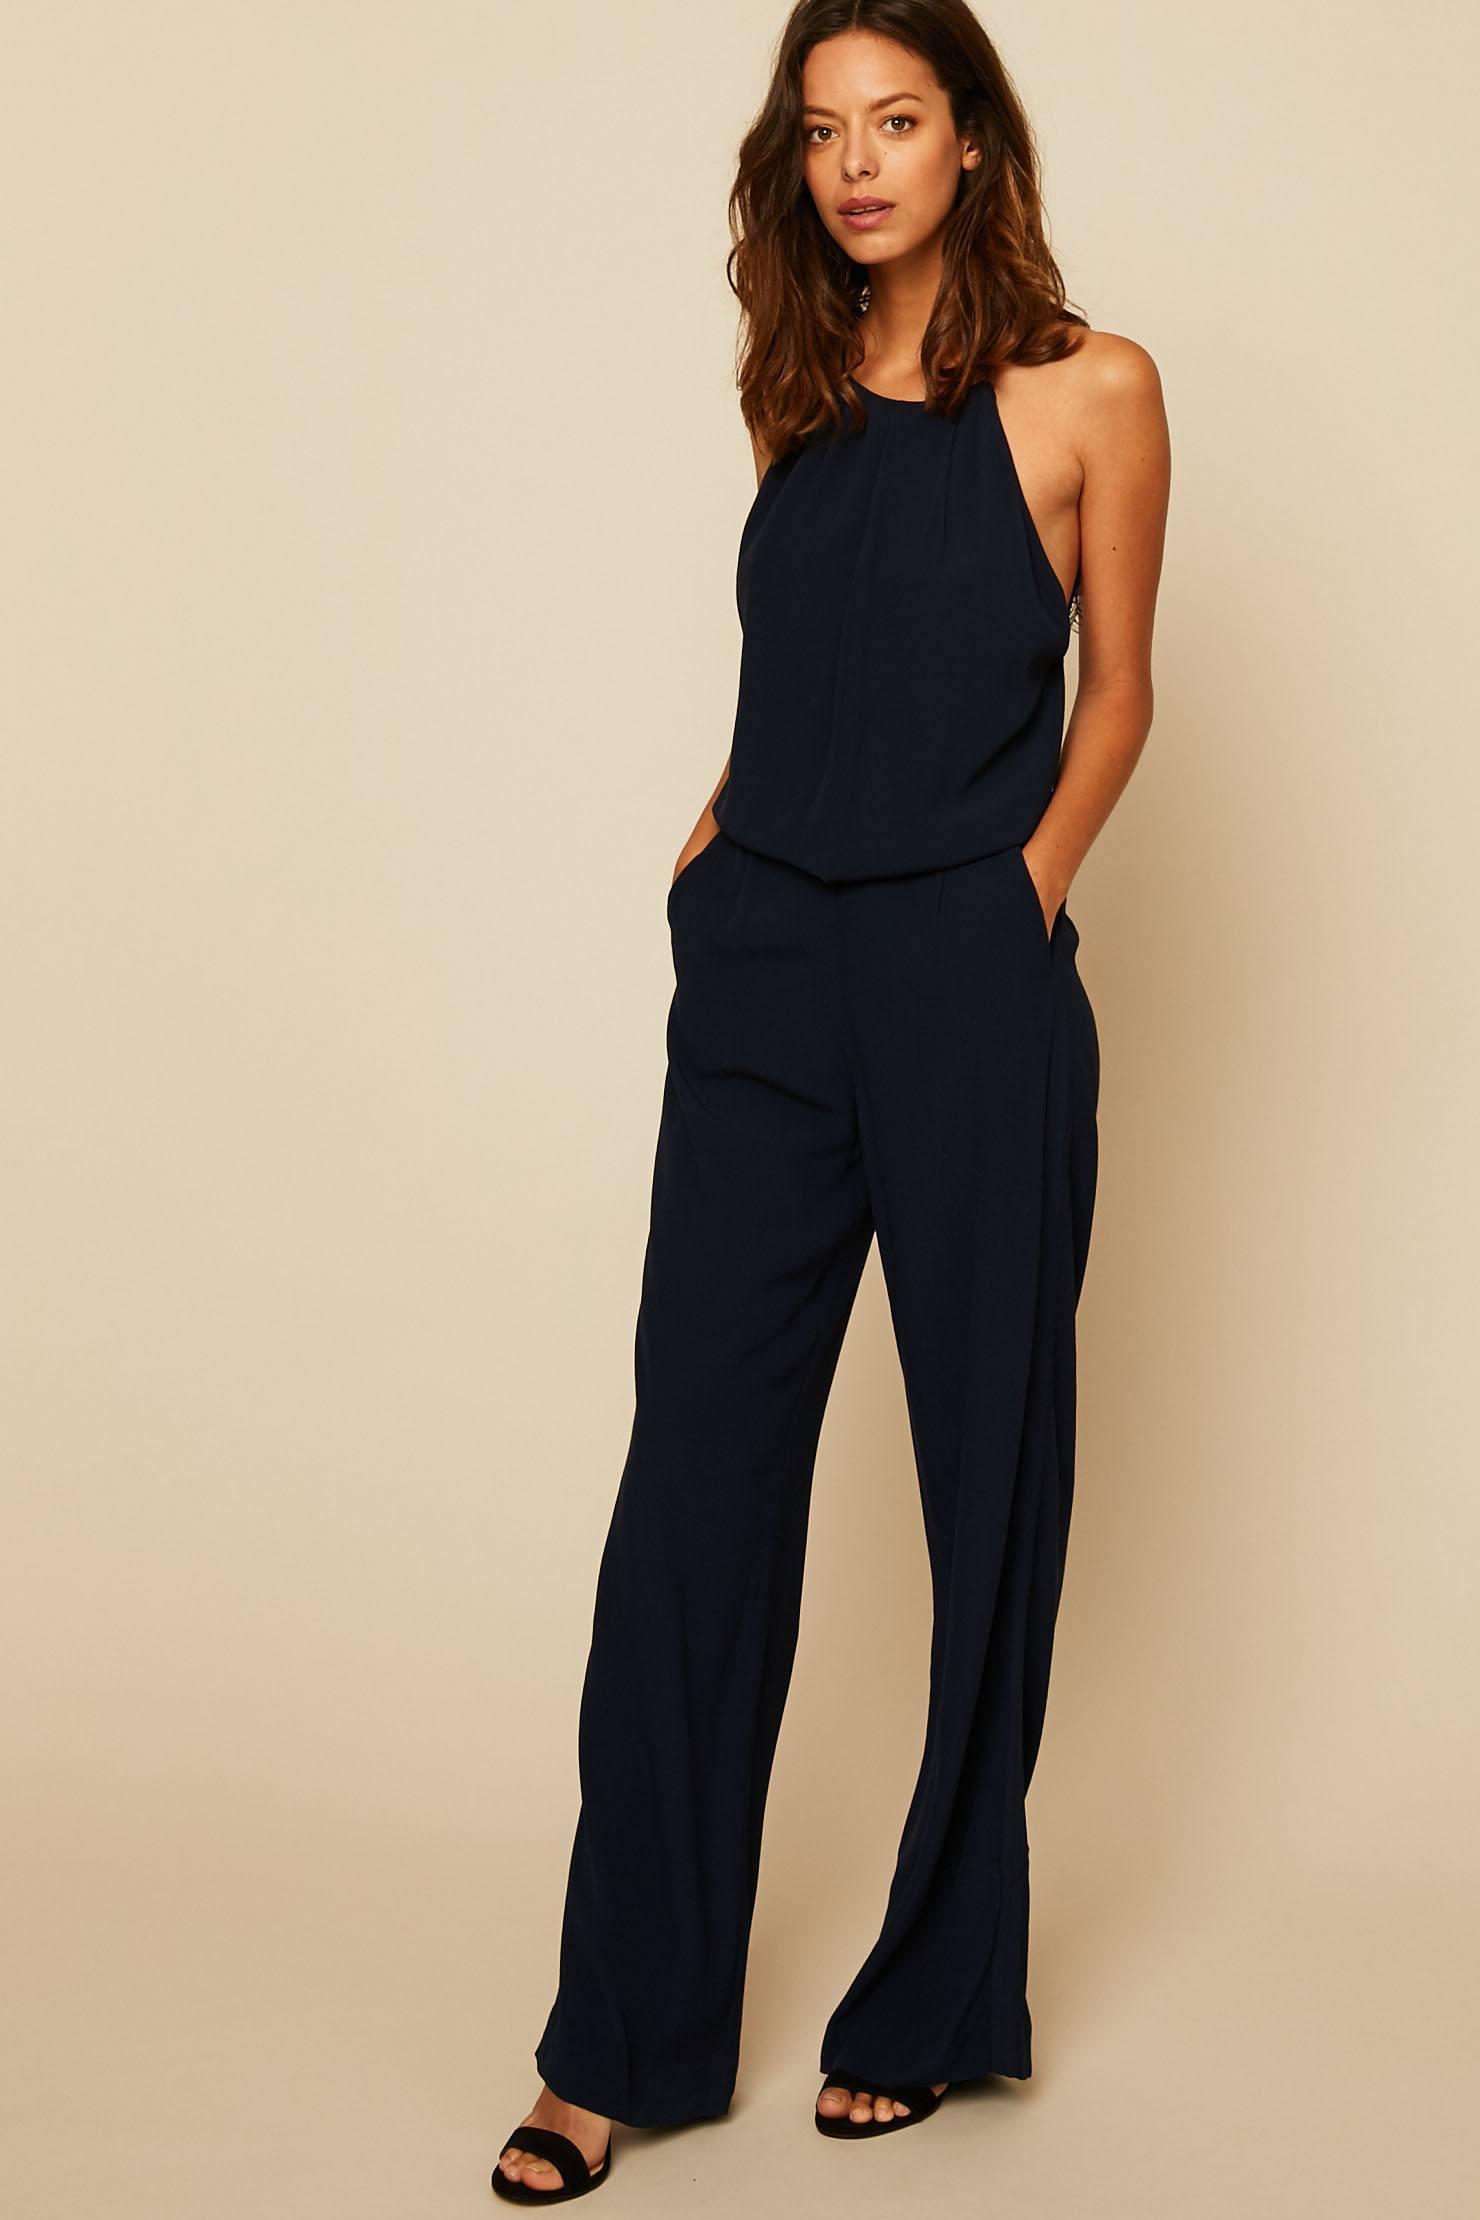 Samsøe Samsøe Combi-pantalon fluide avec dentelle au dos bleu nuit